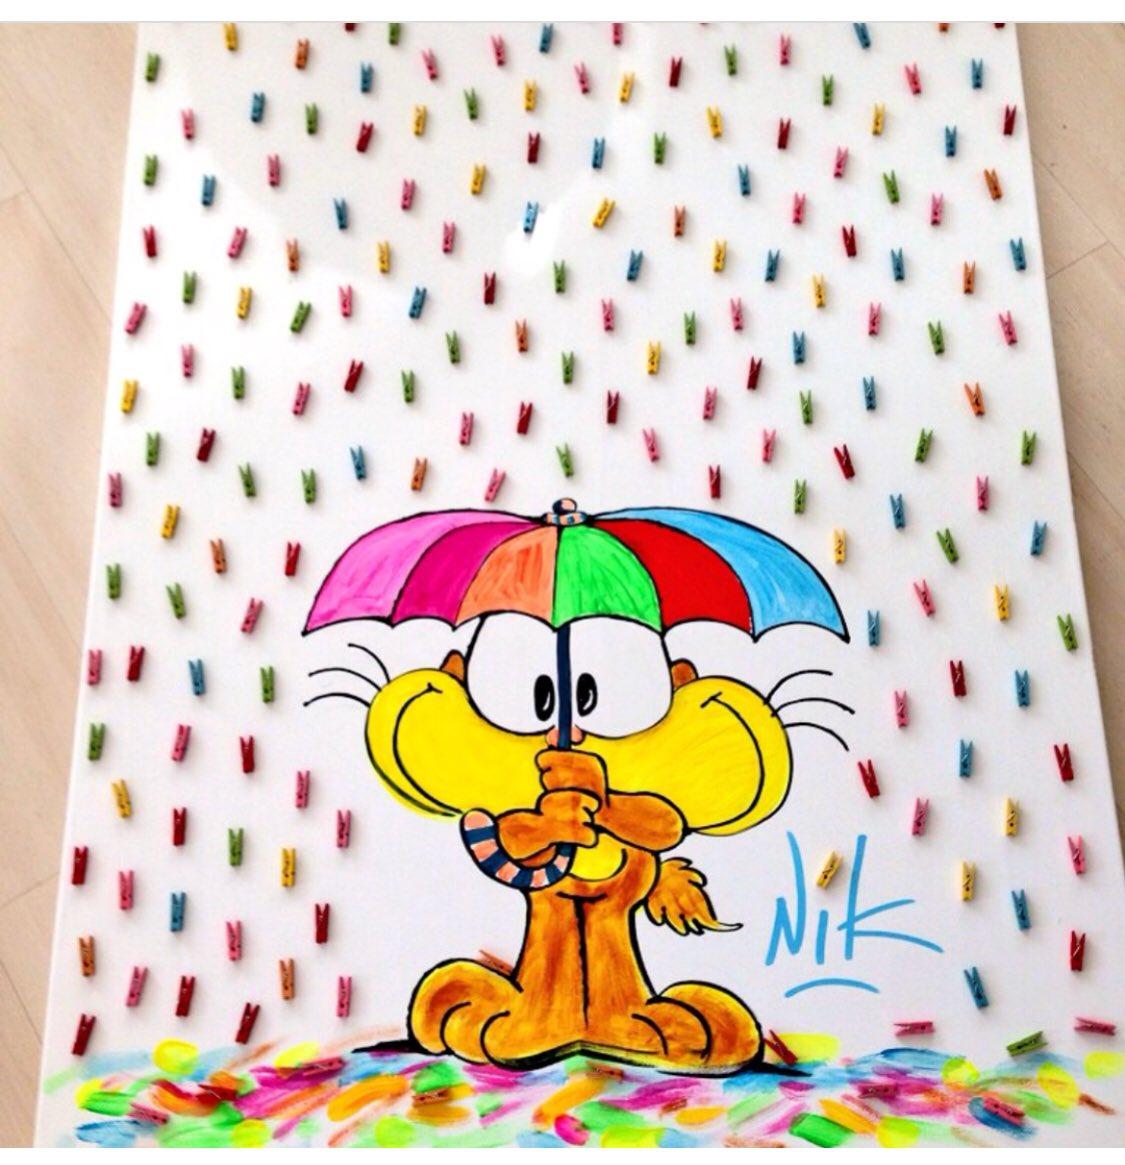 Llueve ☔️☔️☔️🍎🍏🍉🍌🍒#MartesIntratable http...